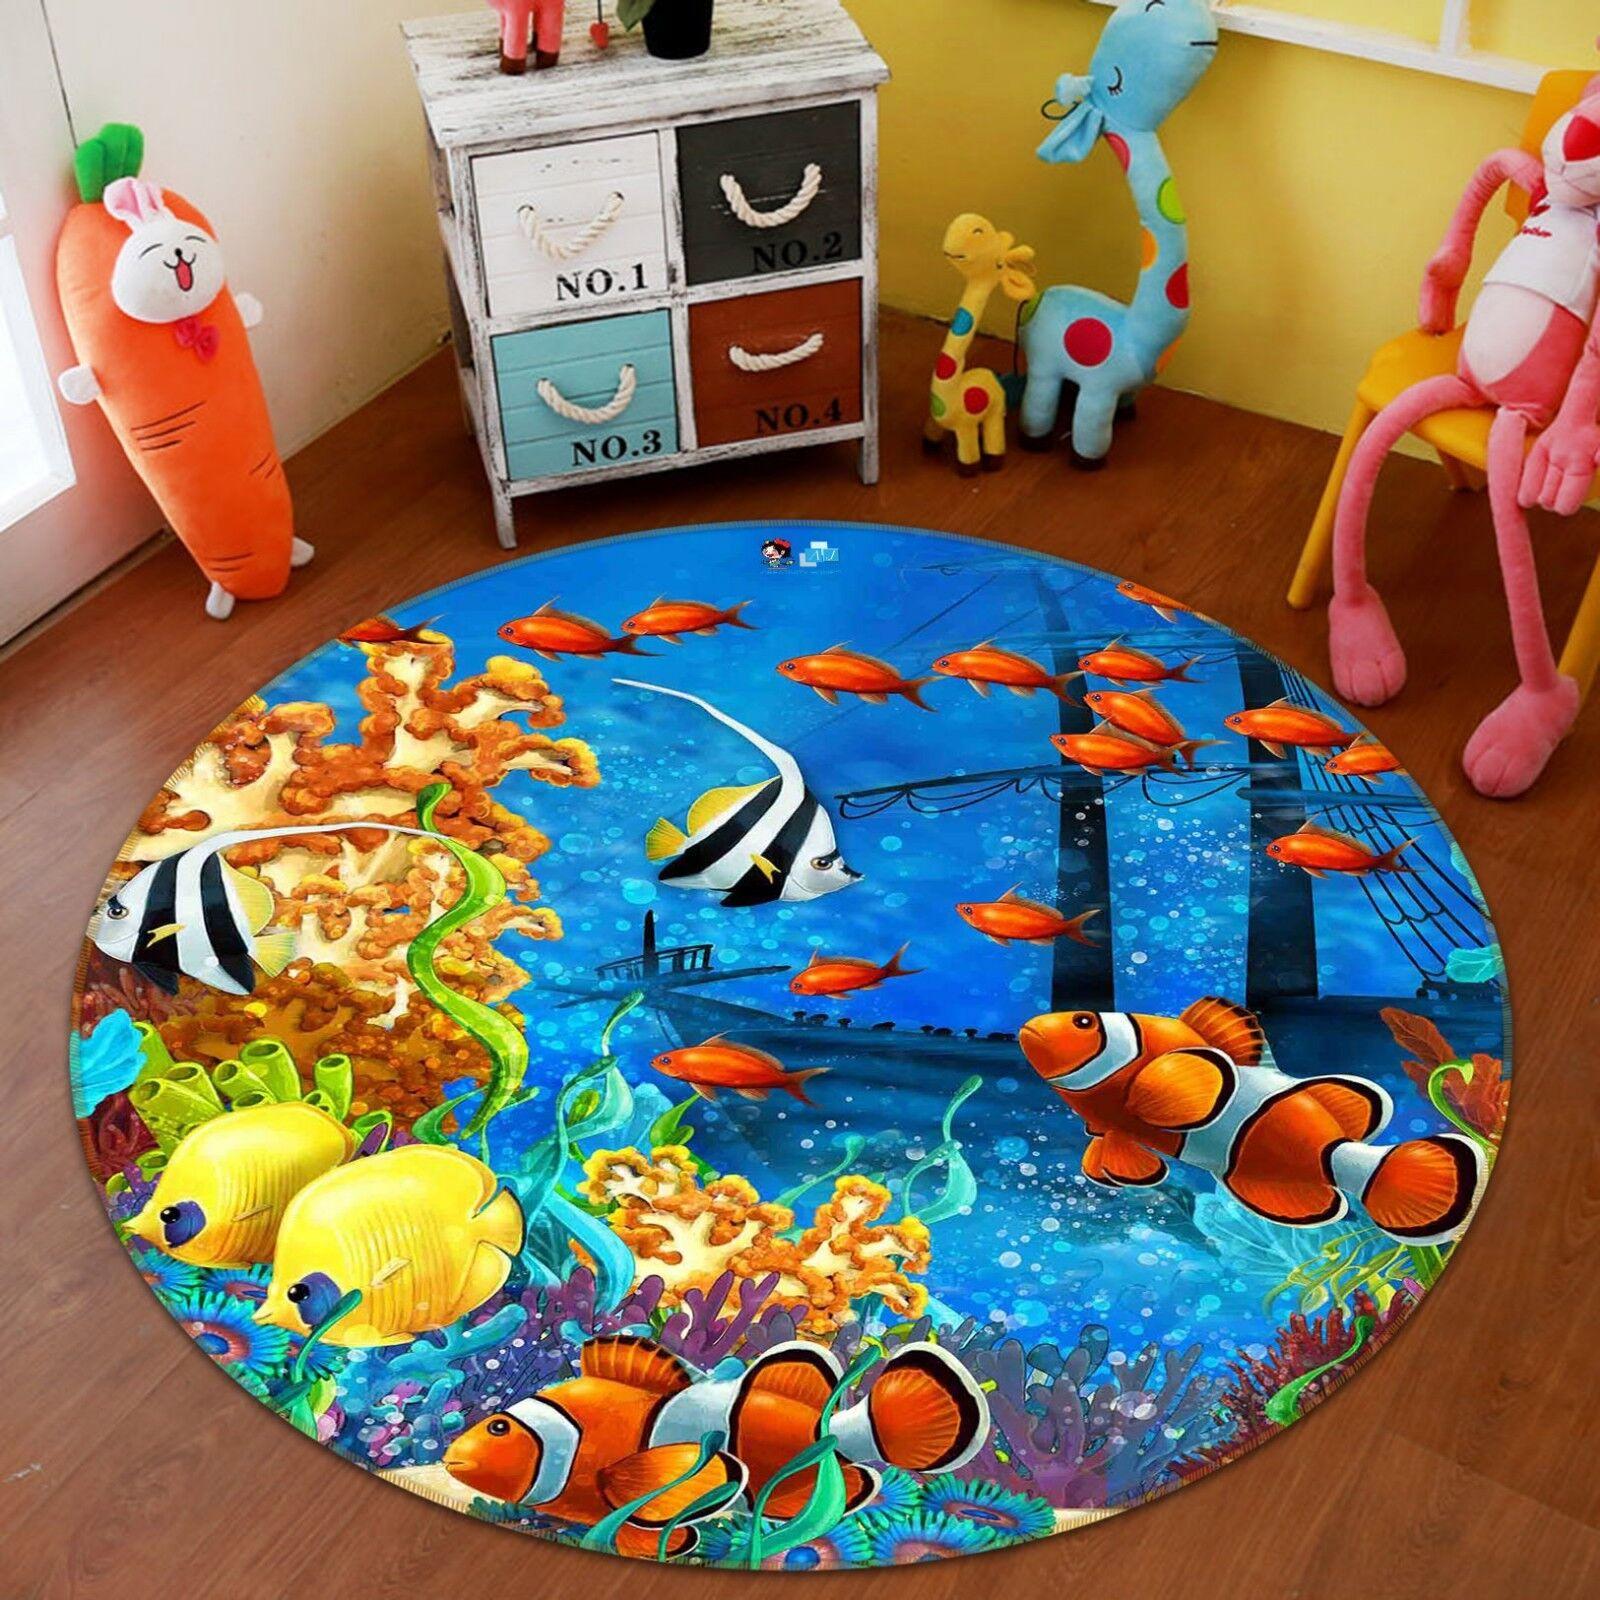 3D PESCE OCEANO 0122 tappetino antiscivolo tappeto camera tappetino tappeto rossoondo elegante UK Carly